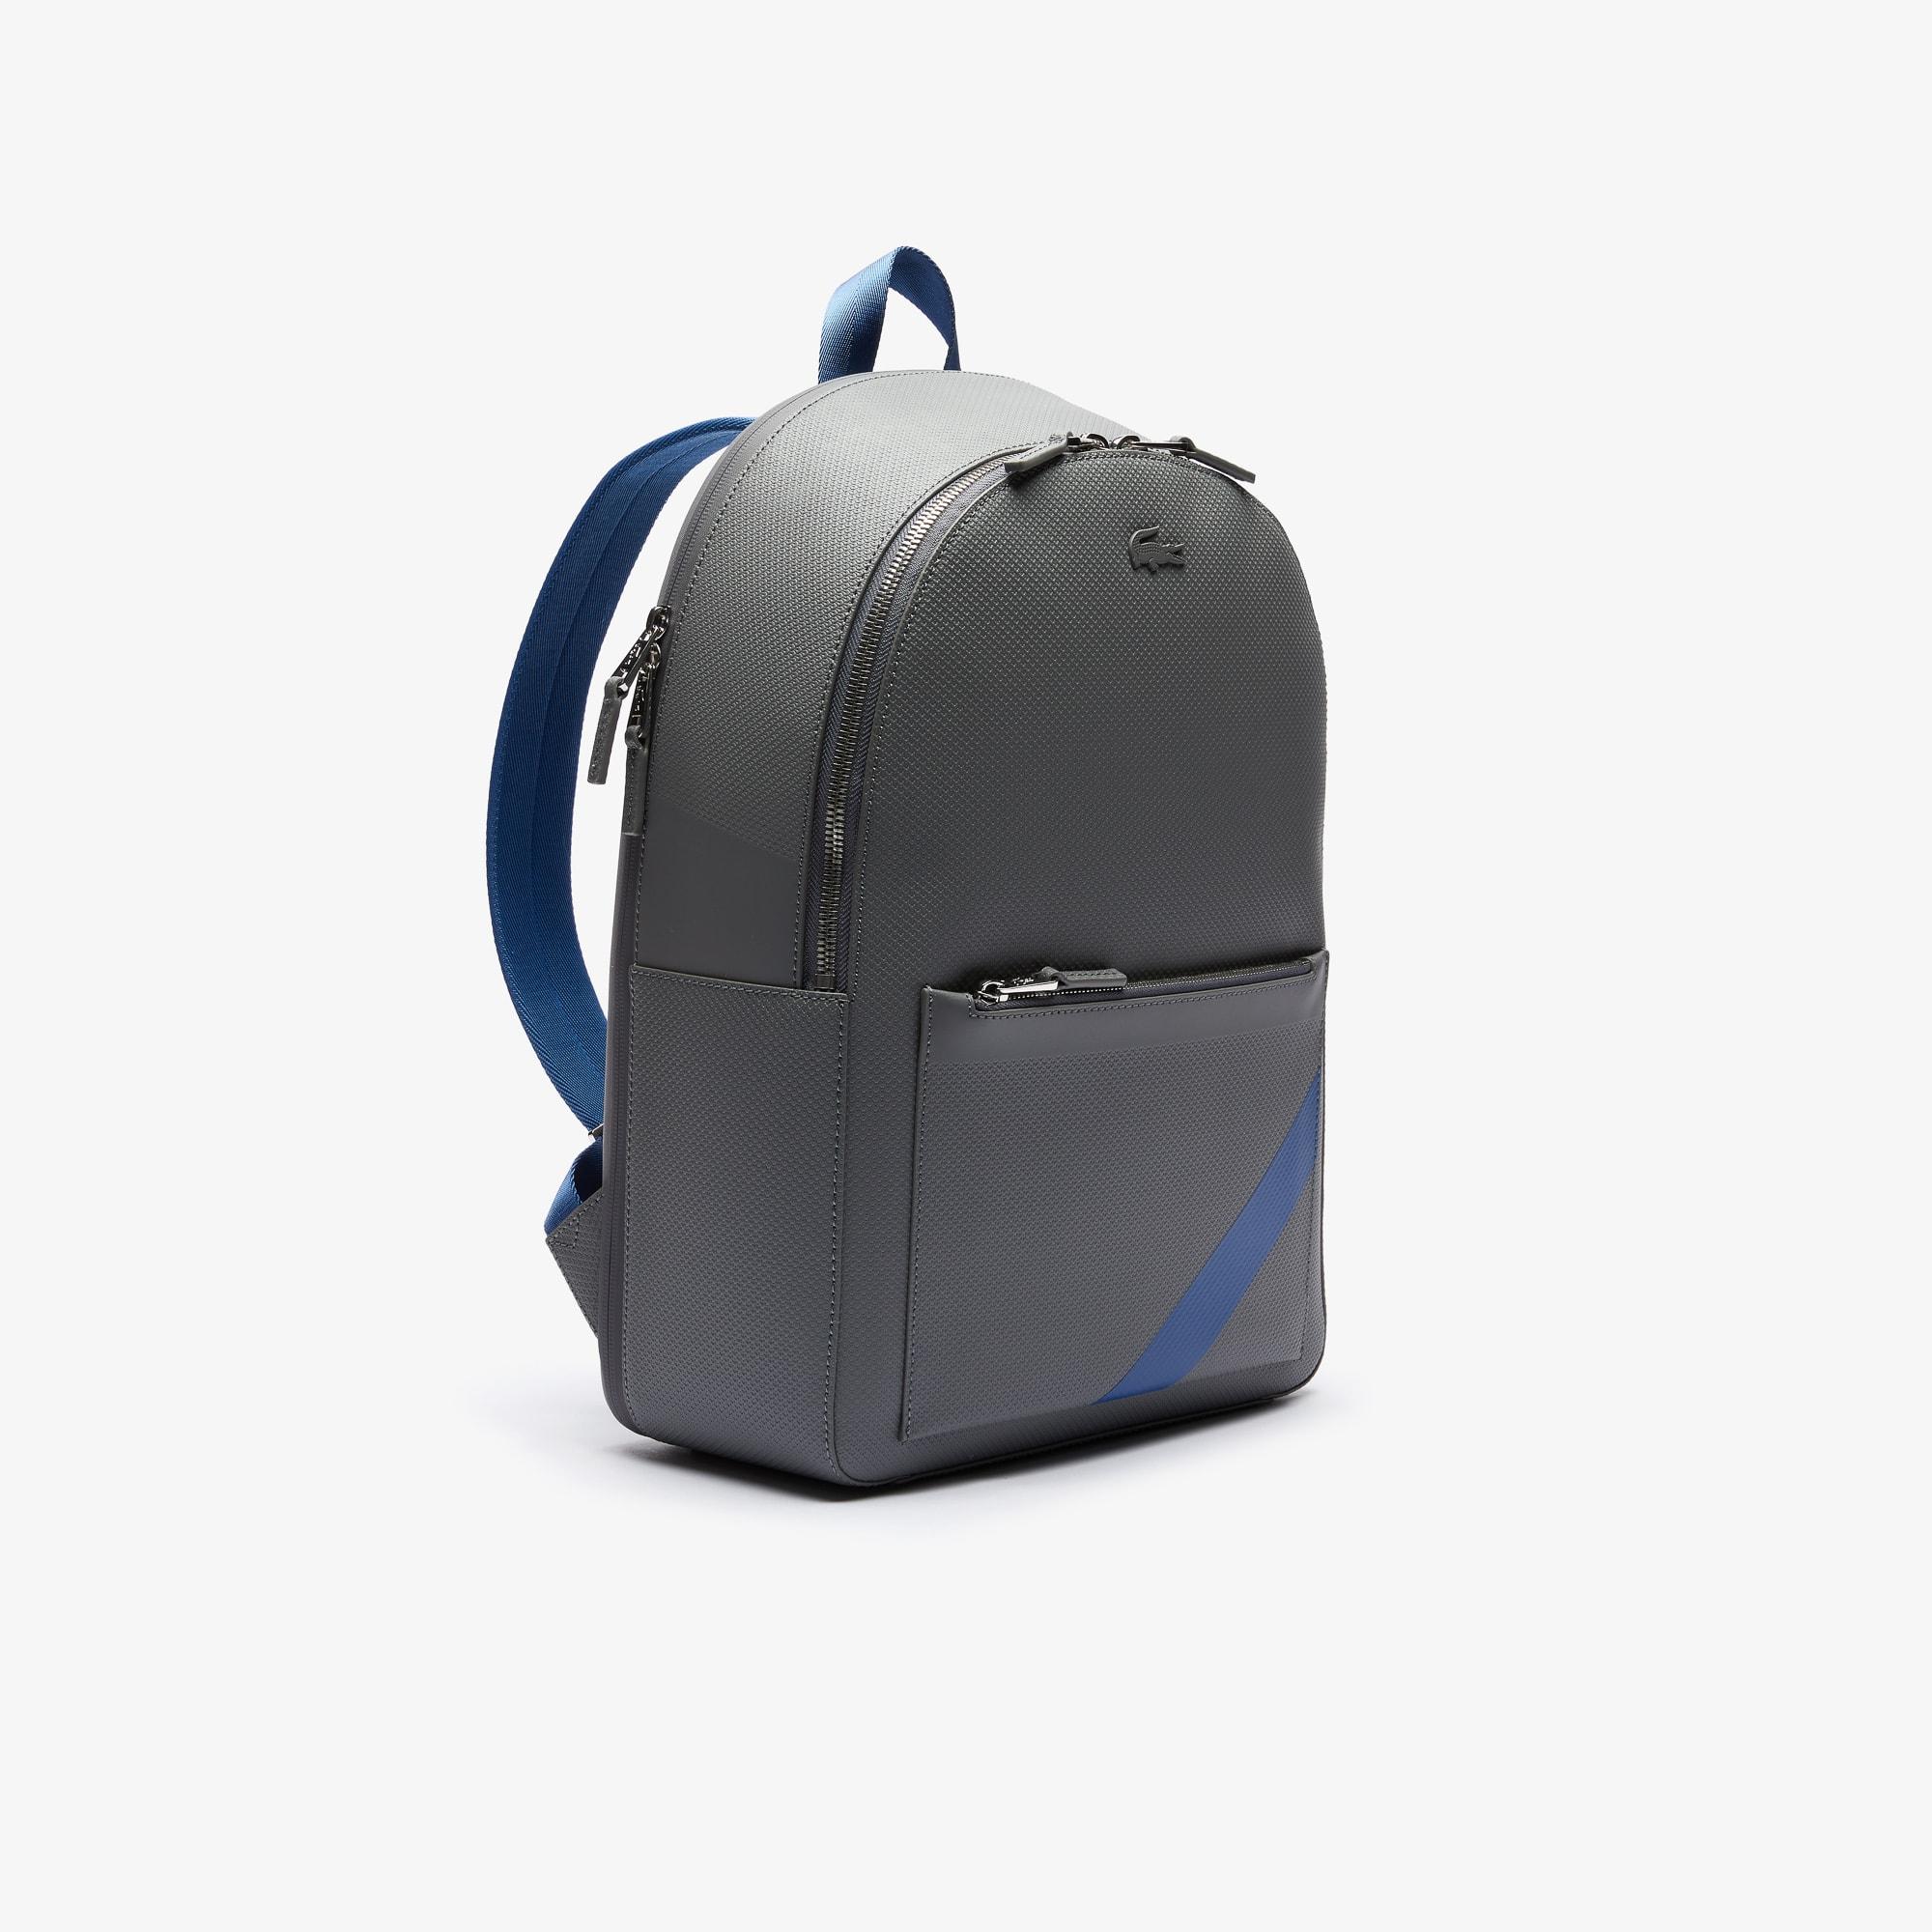 Camera backpackLaptop backpackLeather backpack women /& menCustom backpack3 sizes x 6 colorsMONOGRAMMEDFull grain leather